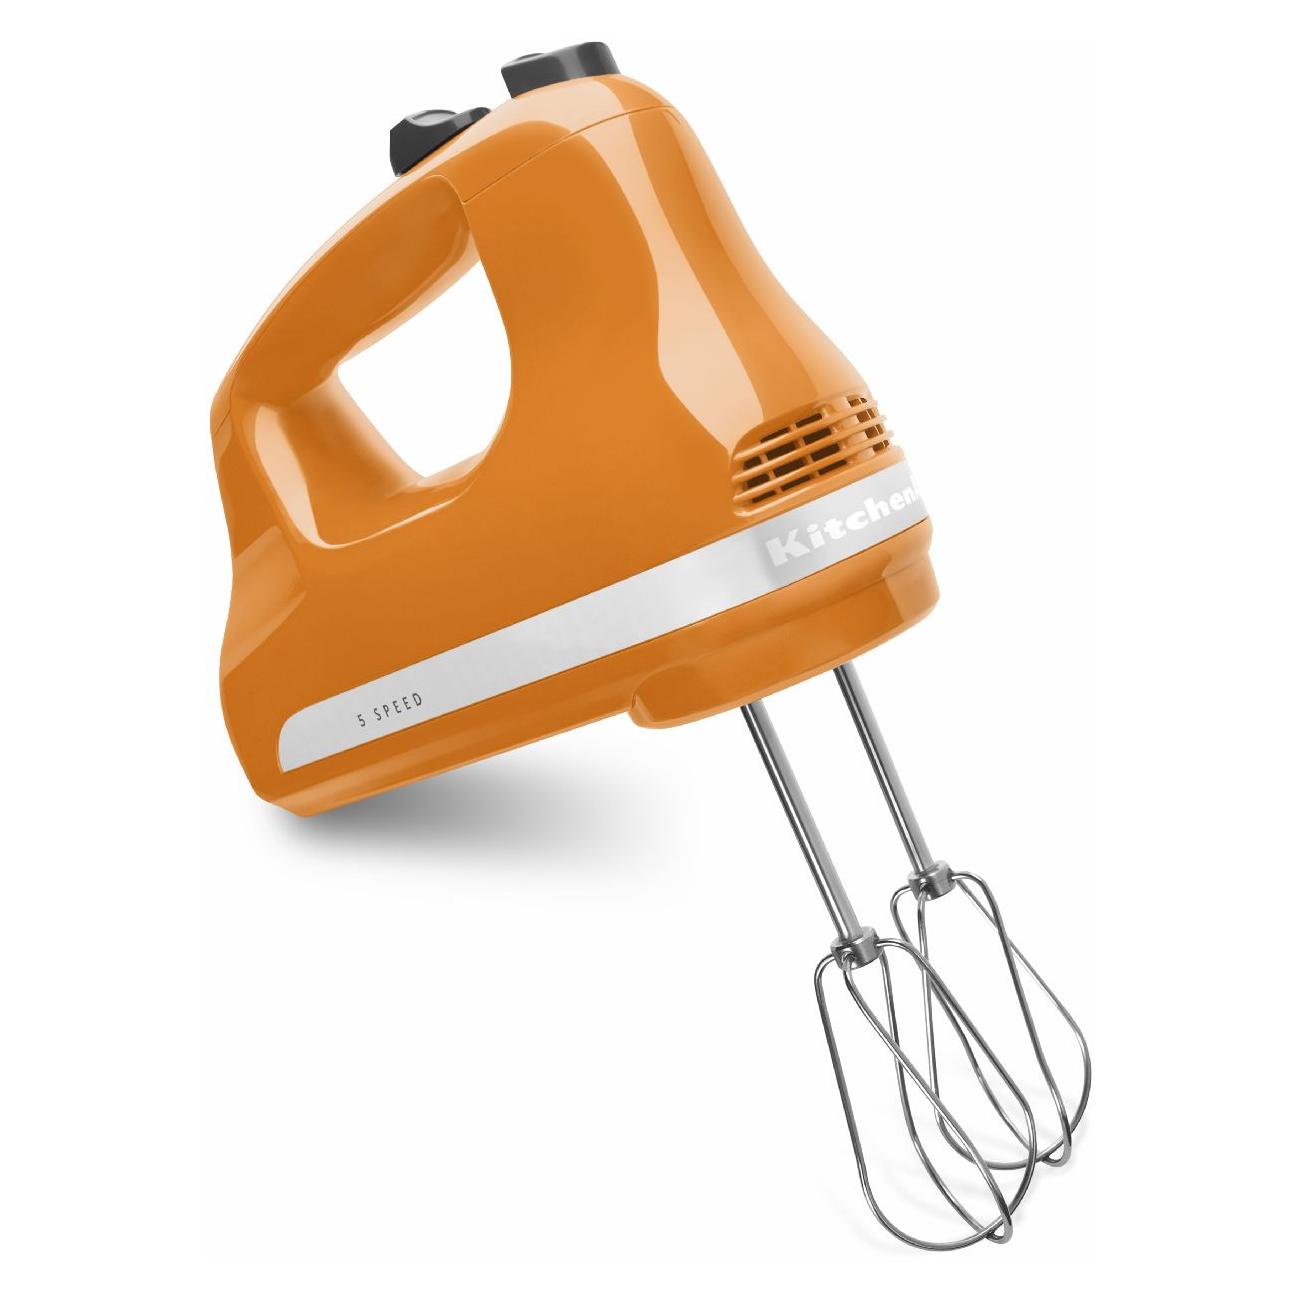 KitchenAid Ultra Power Tangerine Orange 5-Speed Hand Mixer